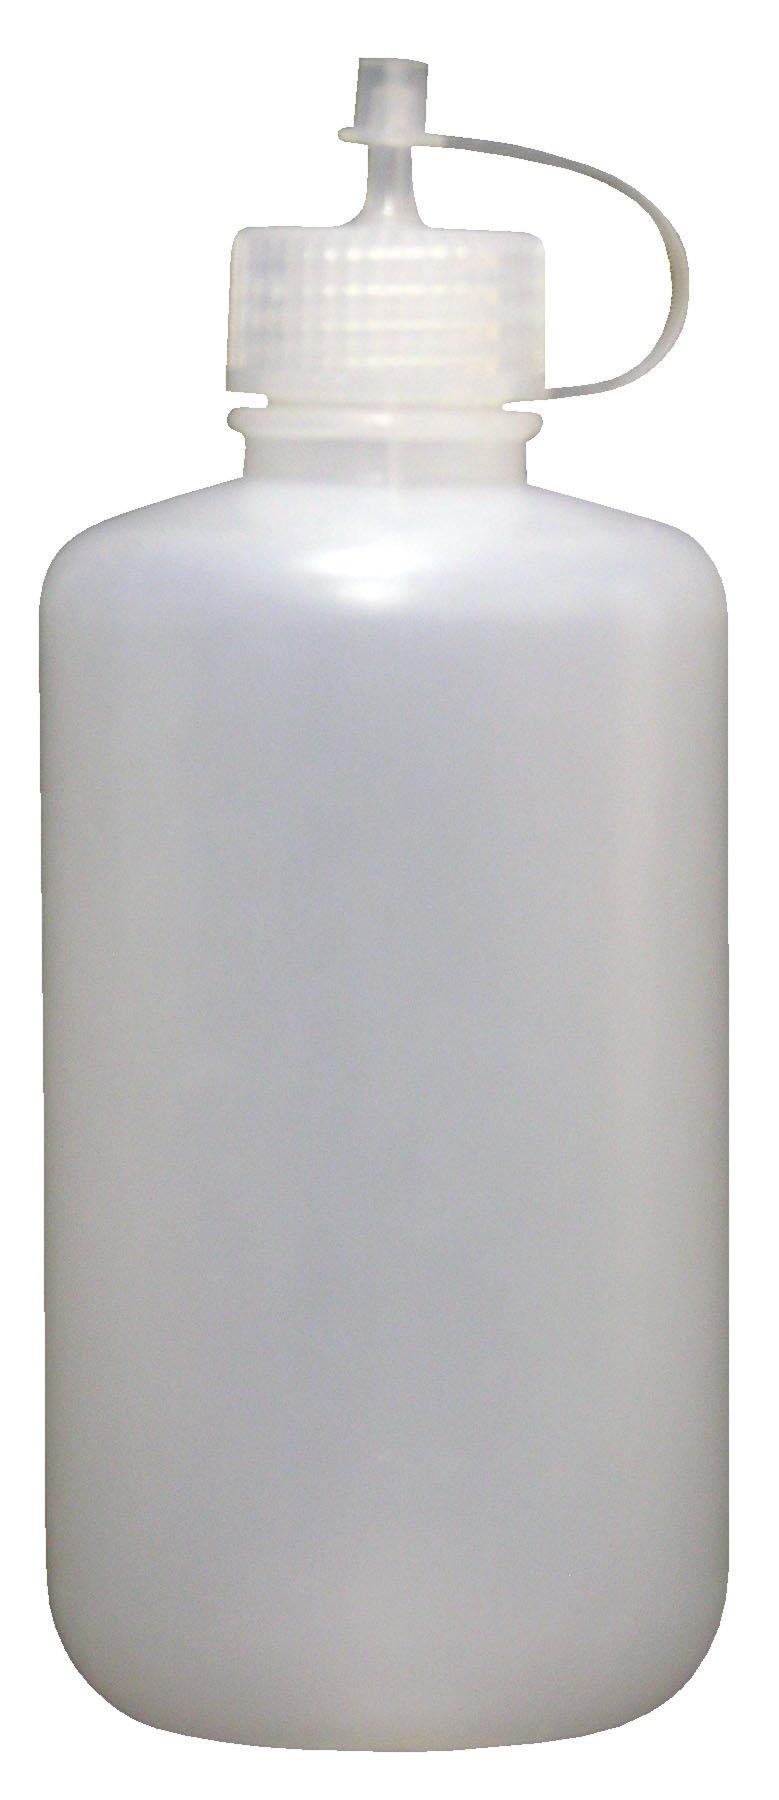 Vestil BTL-RD-8 Low Density Polyethylene (LDPE) Round Squeeze Dispensing Bottle with Drop Cap, 8 oz Capacity, Clear